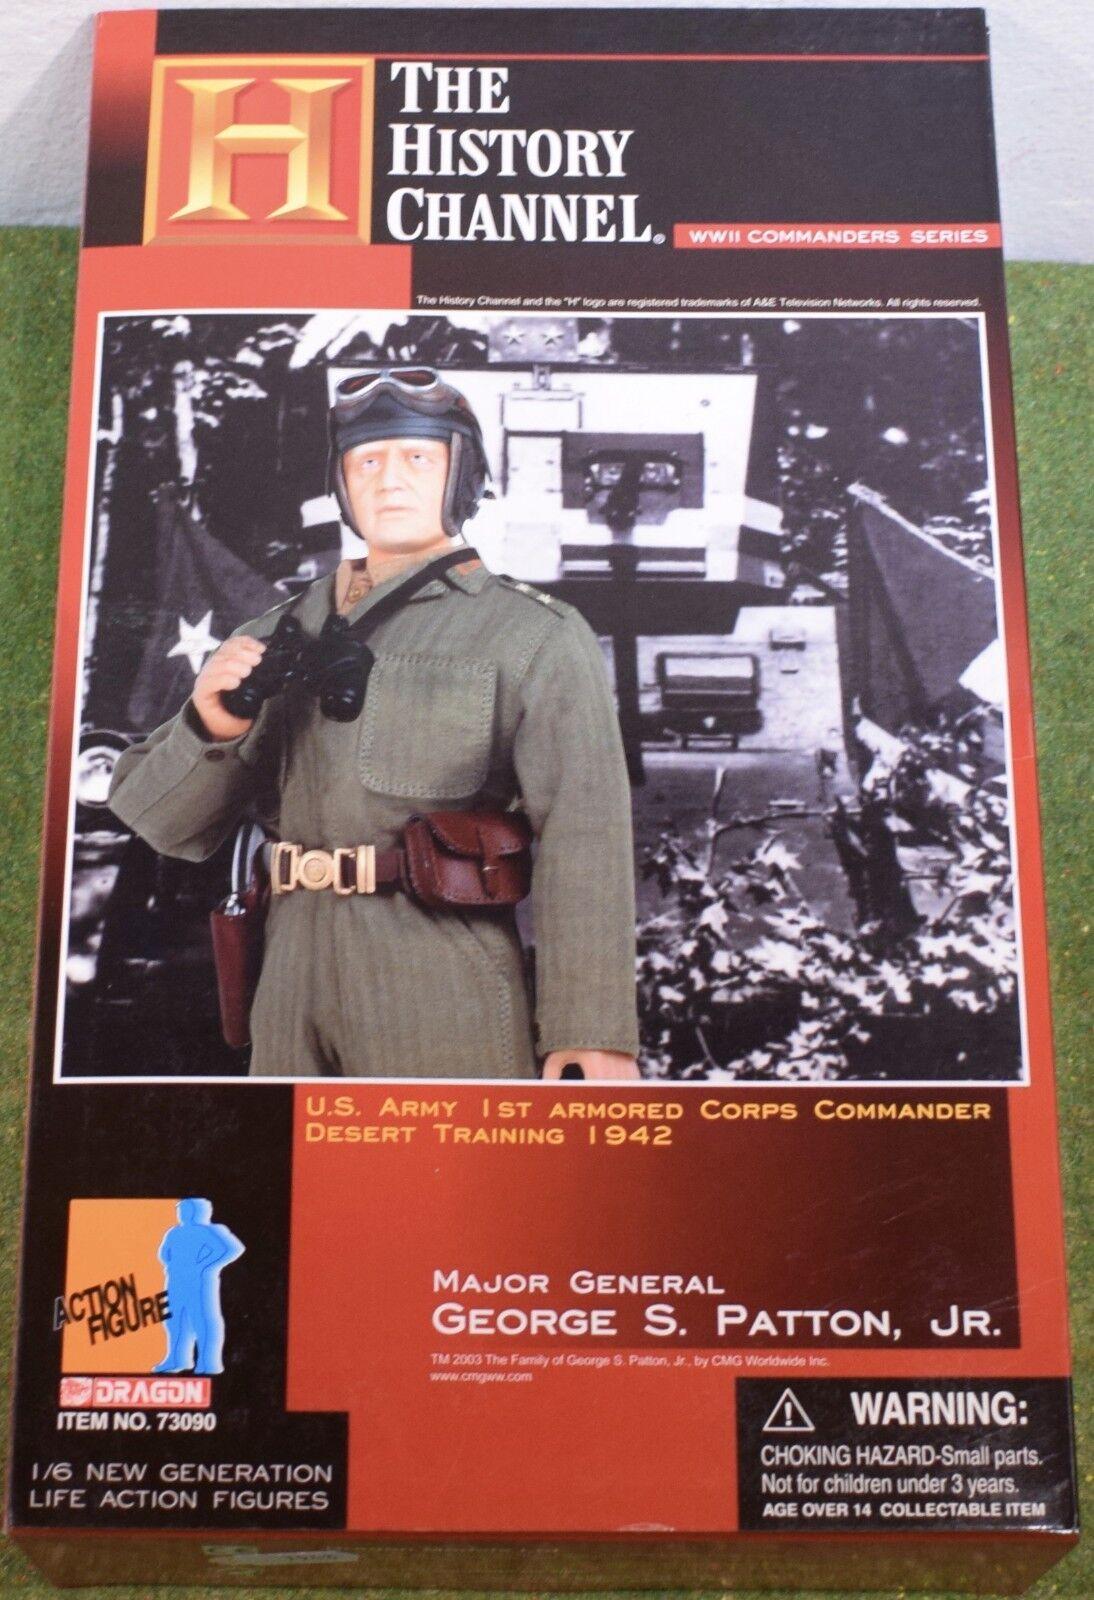 Dragon 1/6 SCALA WW II US George S. Patton JR-IL GENERALE 73090